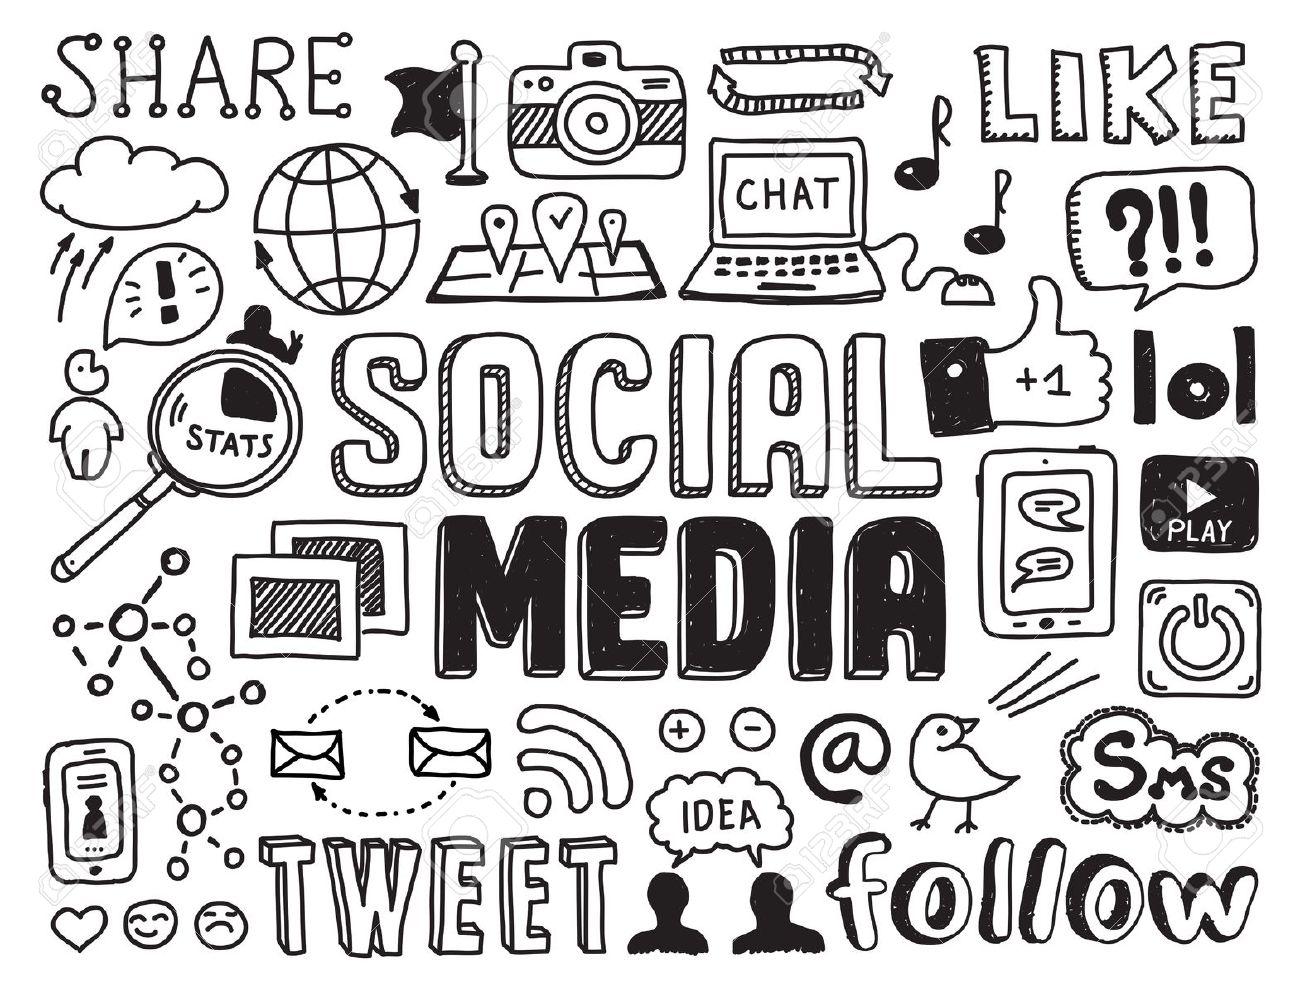 Social media clipart set image stock Social media clipart black and white - ClipartFest image stock